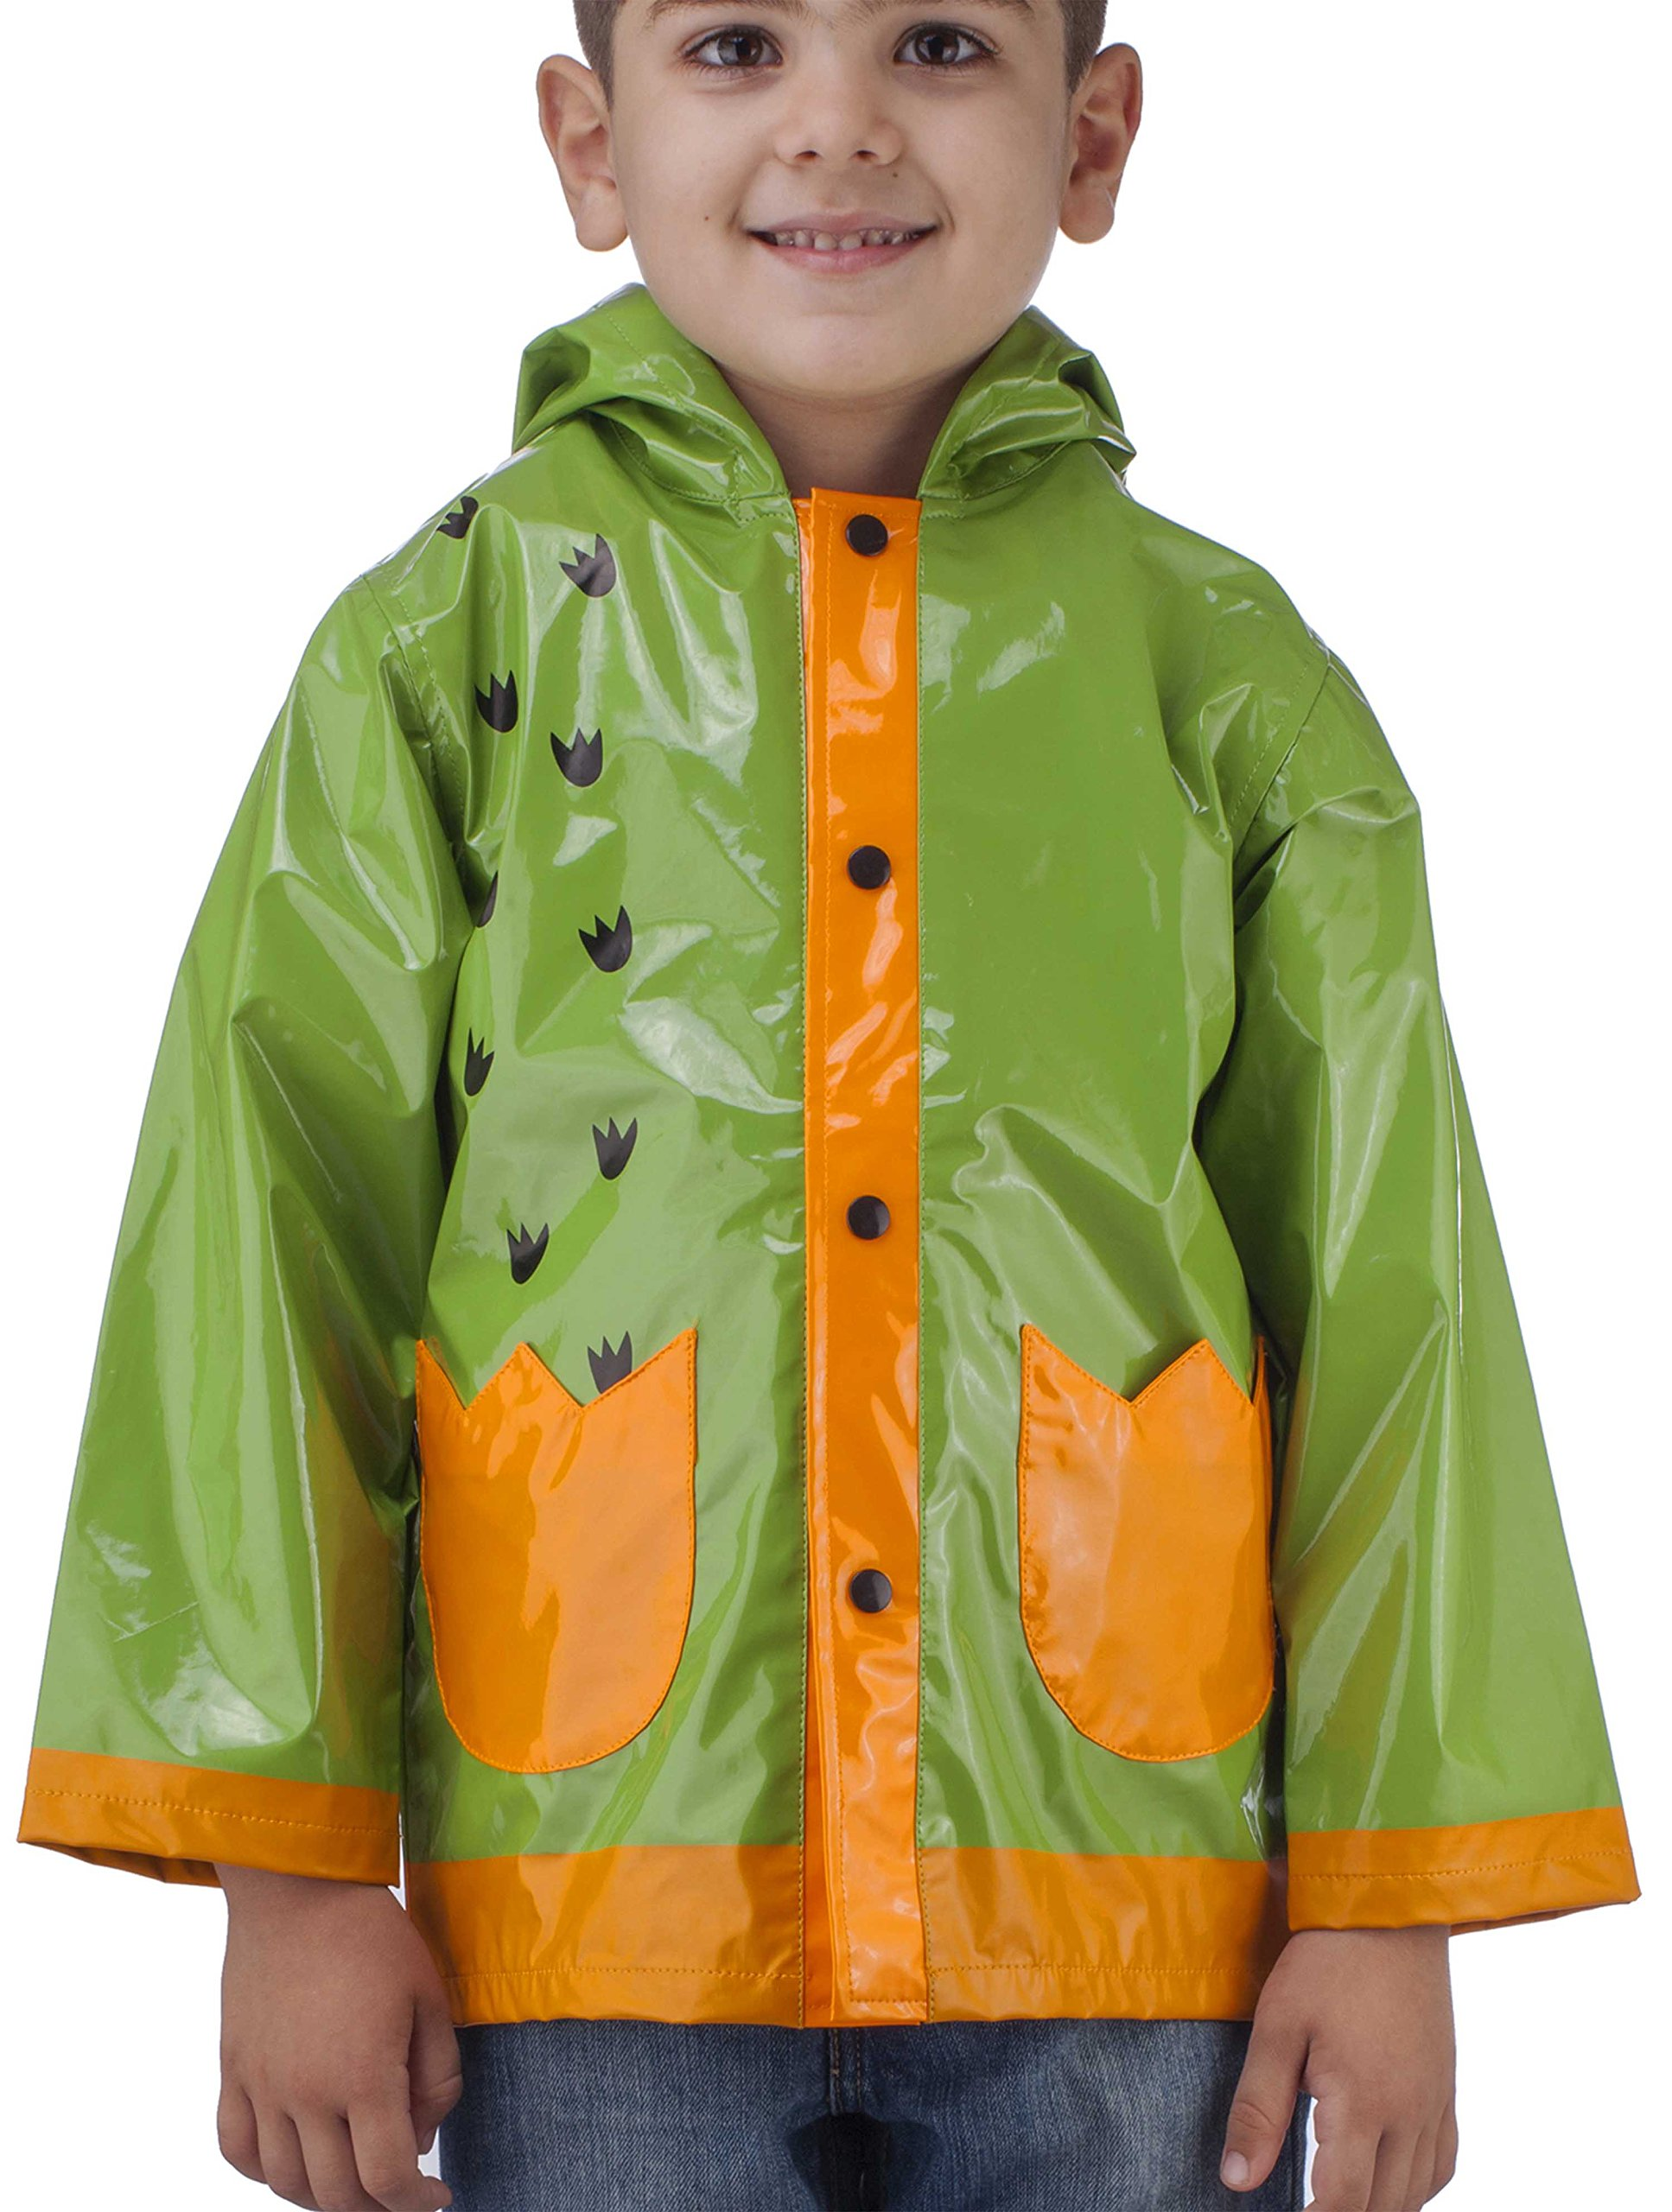 Little Boy's Dinosaurs Green Raincoat - Size 7